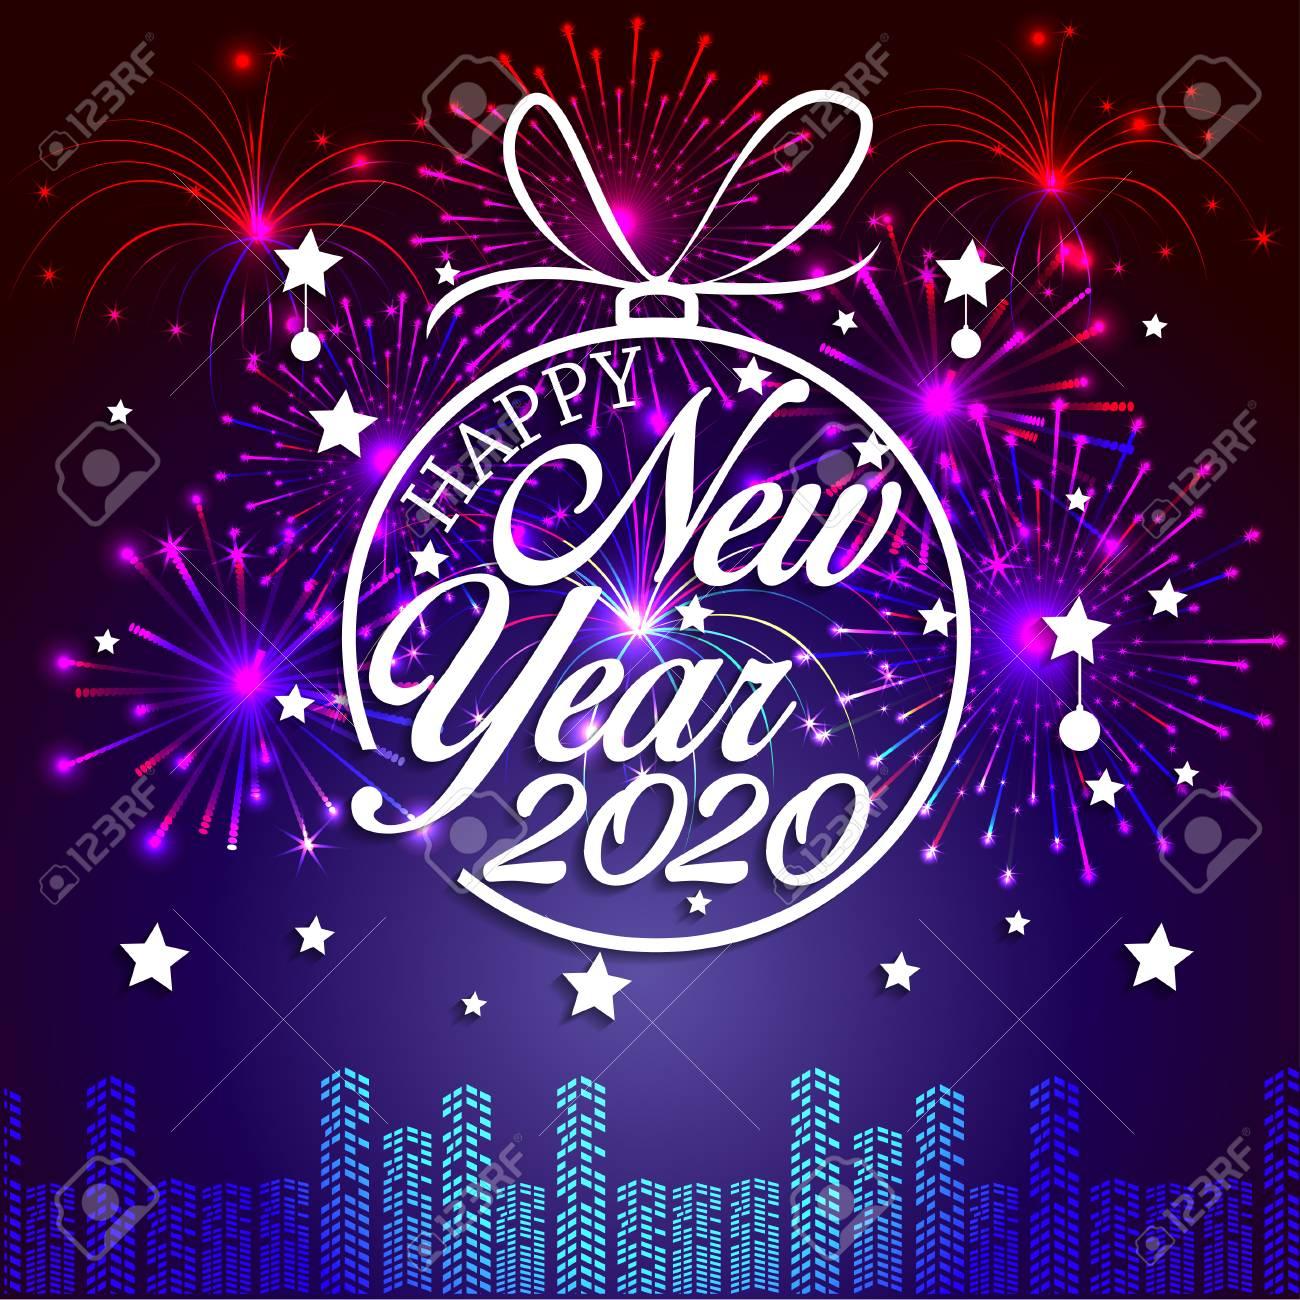 Happy new year image 2020.com